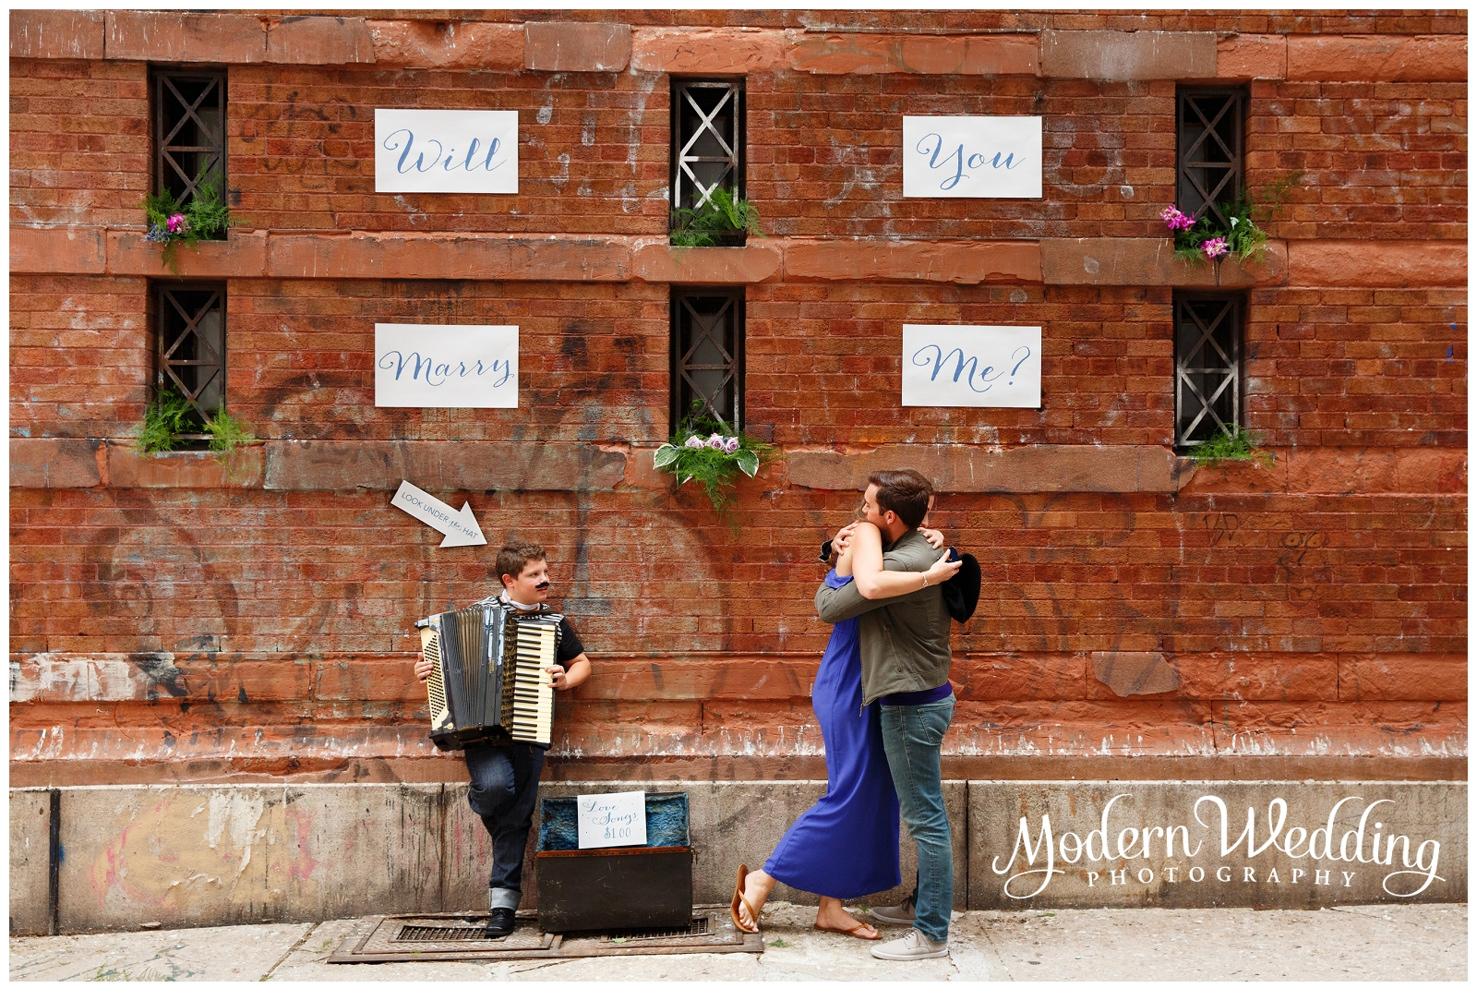 Modern Wedding Photography 18